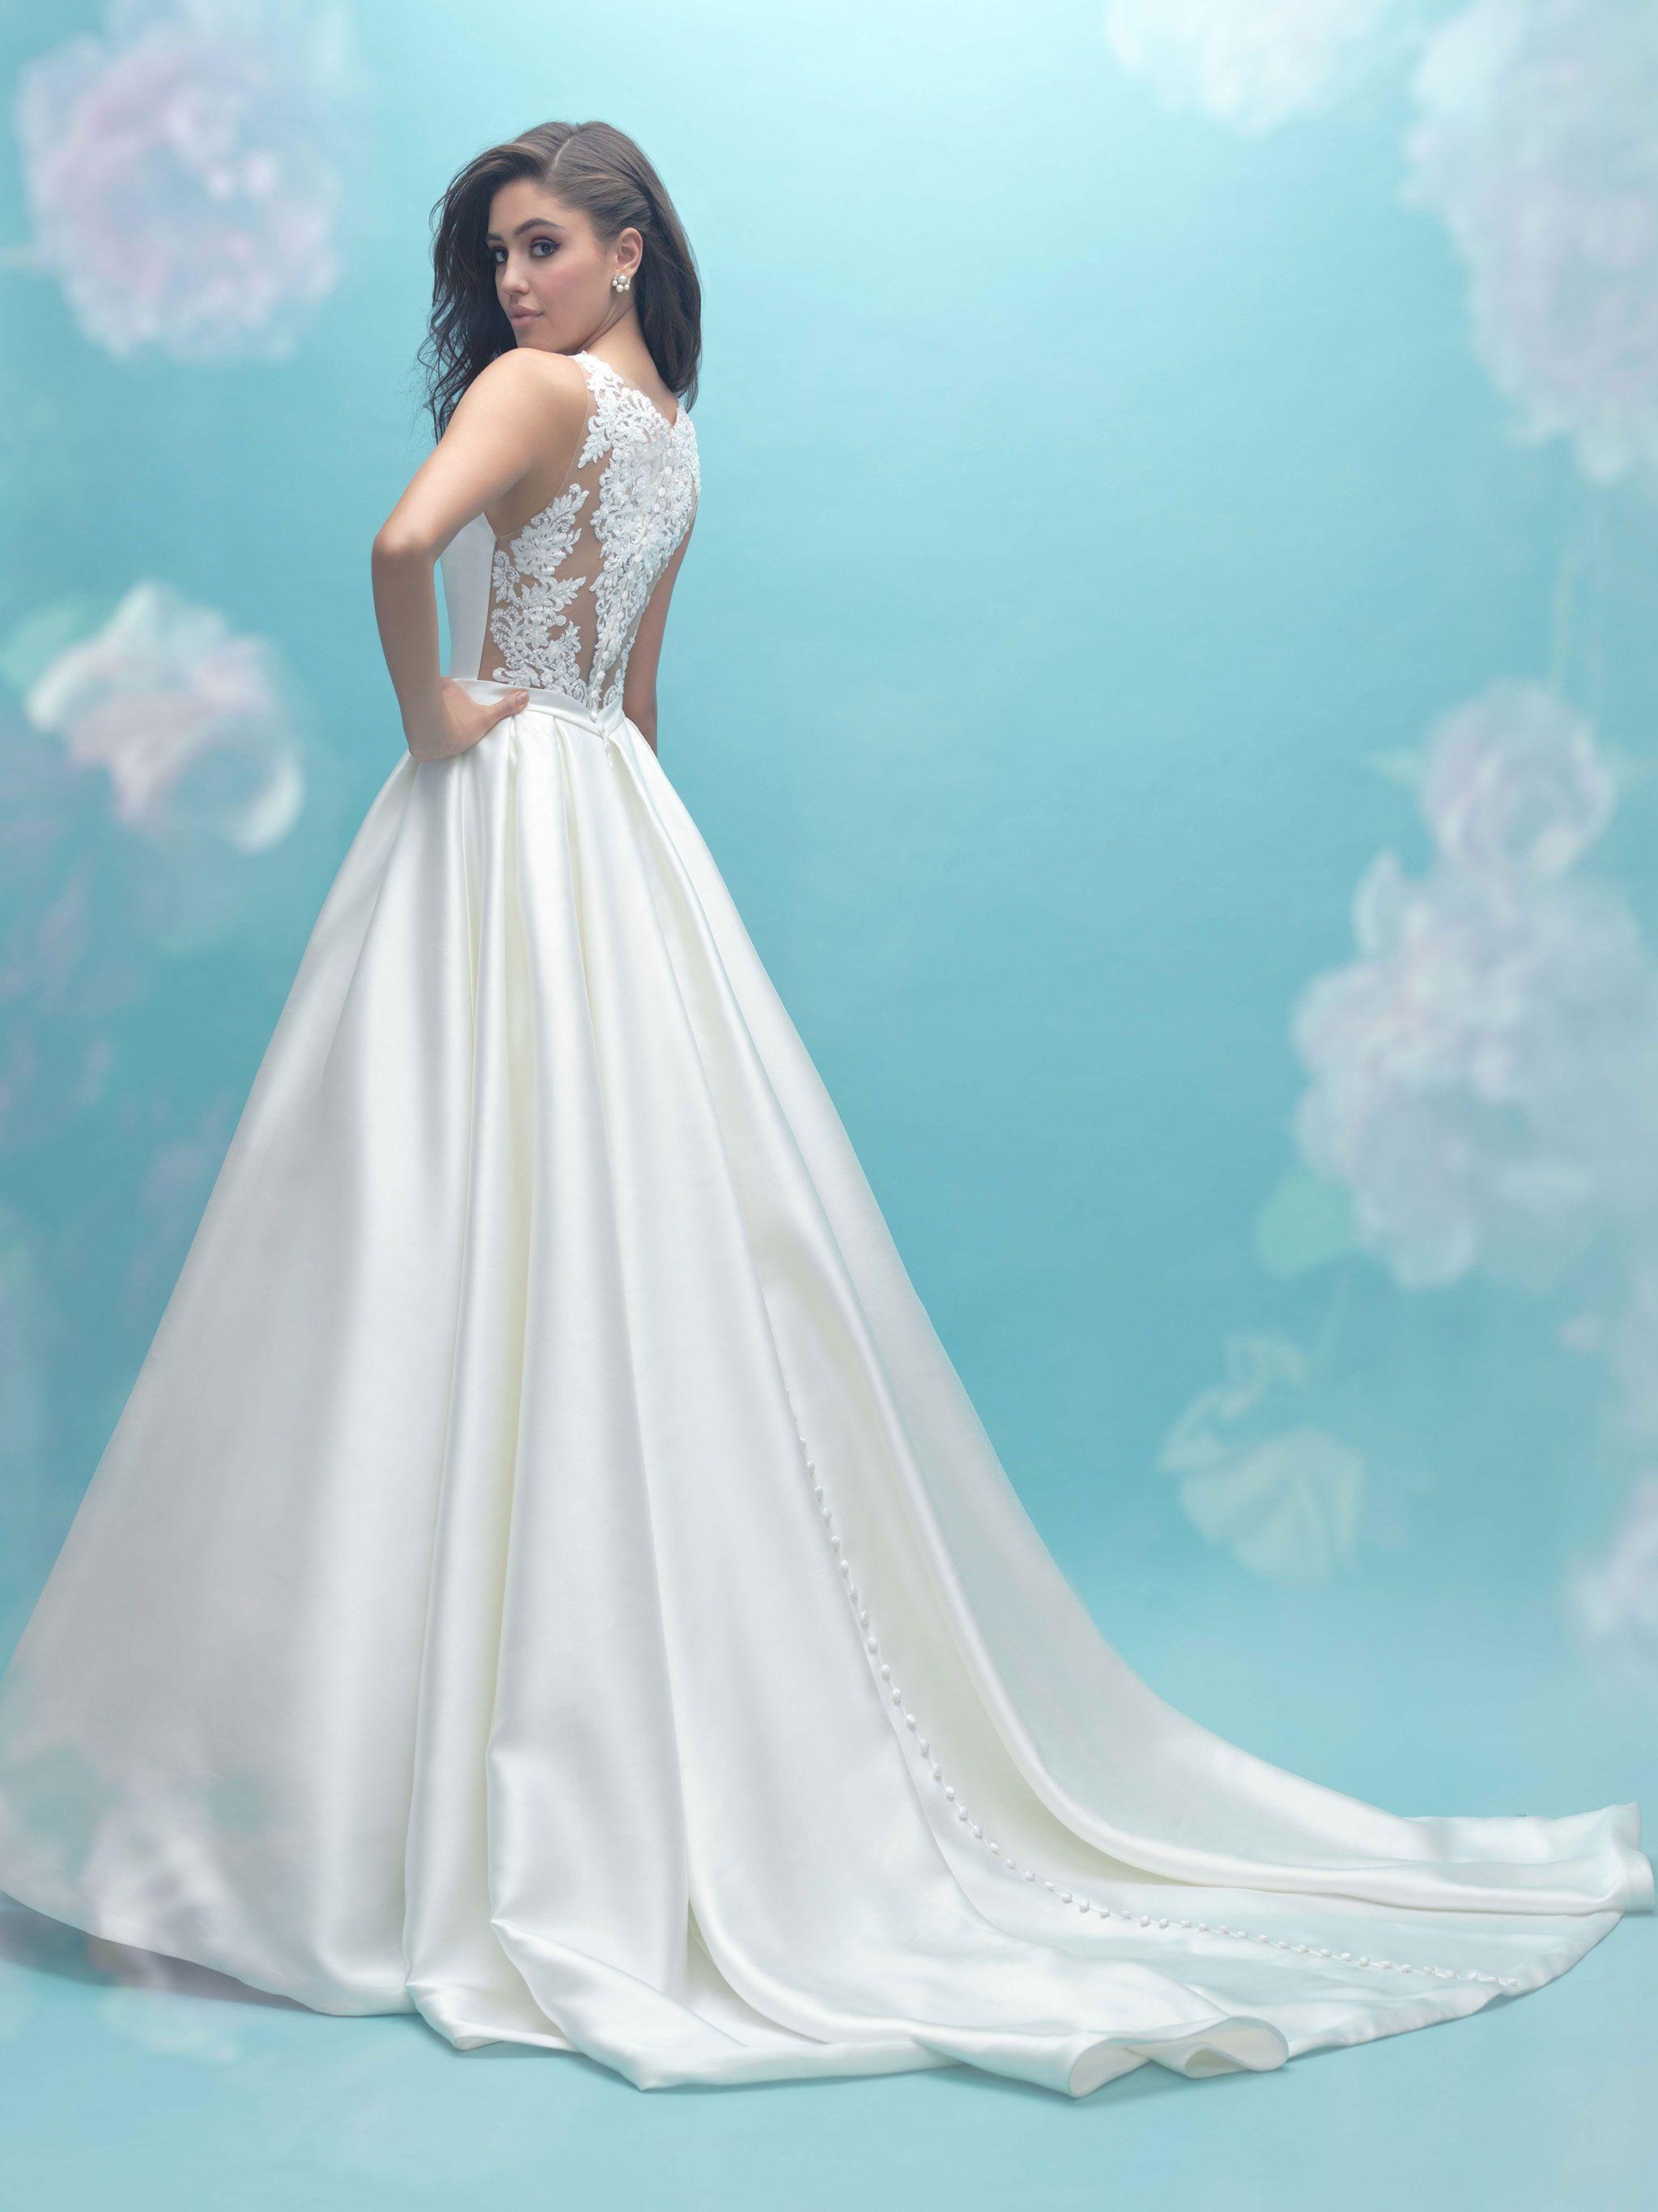 Allure 9473 Back Popular Wedding Dresses Bridal Gowns Tiffany Blue Weddings: Tiffany Blue Wedding Dress At Reisefeber.org